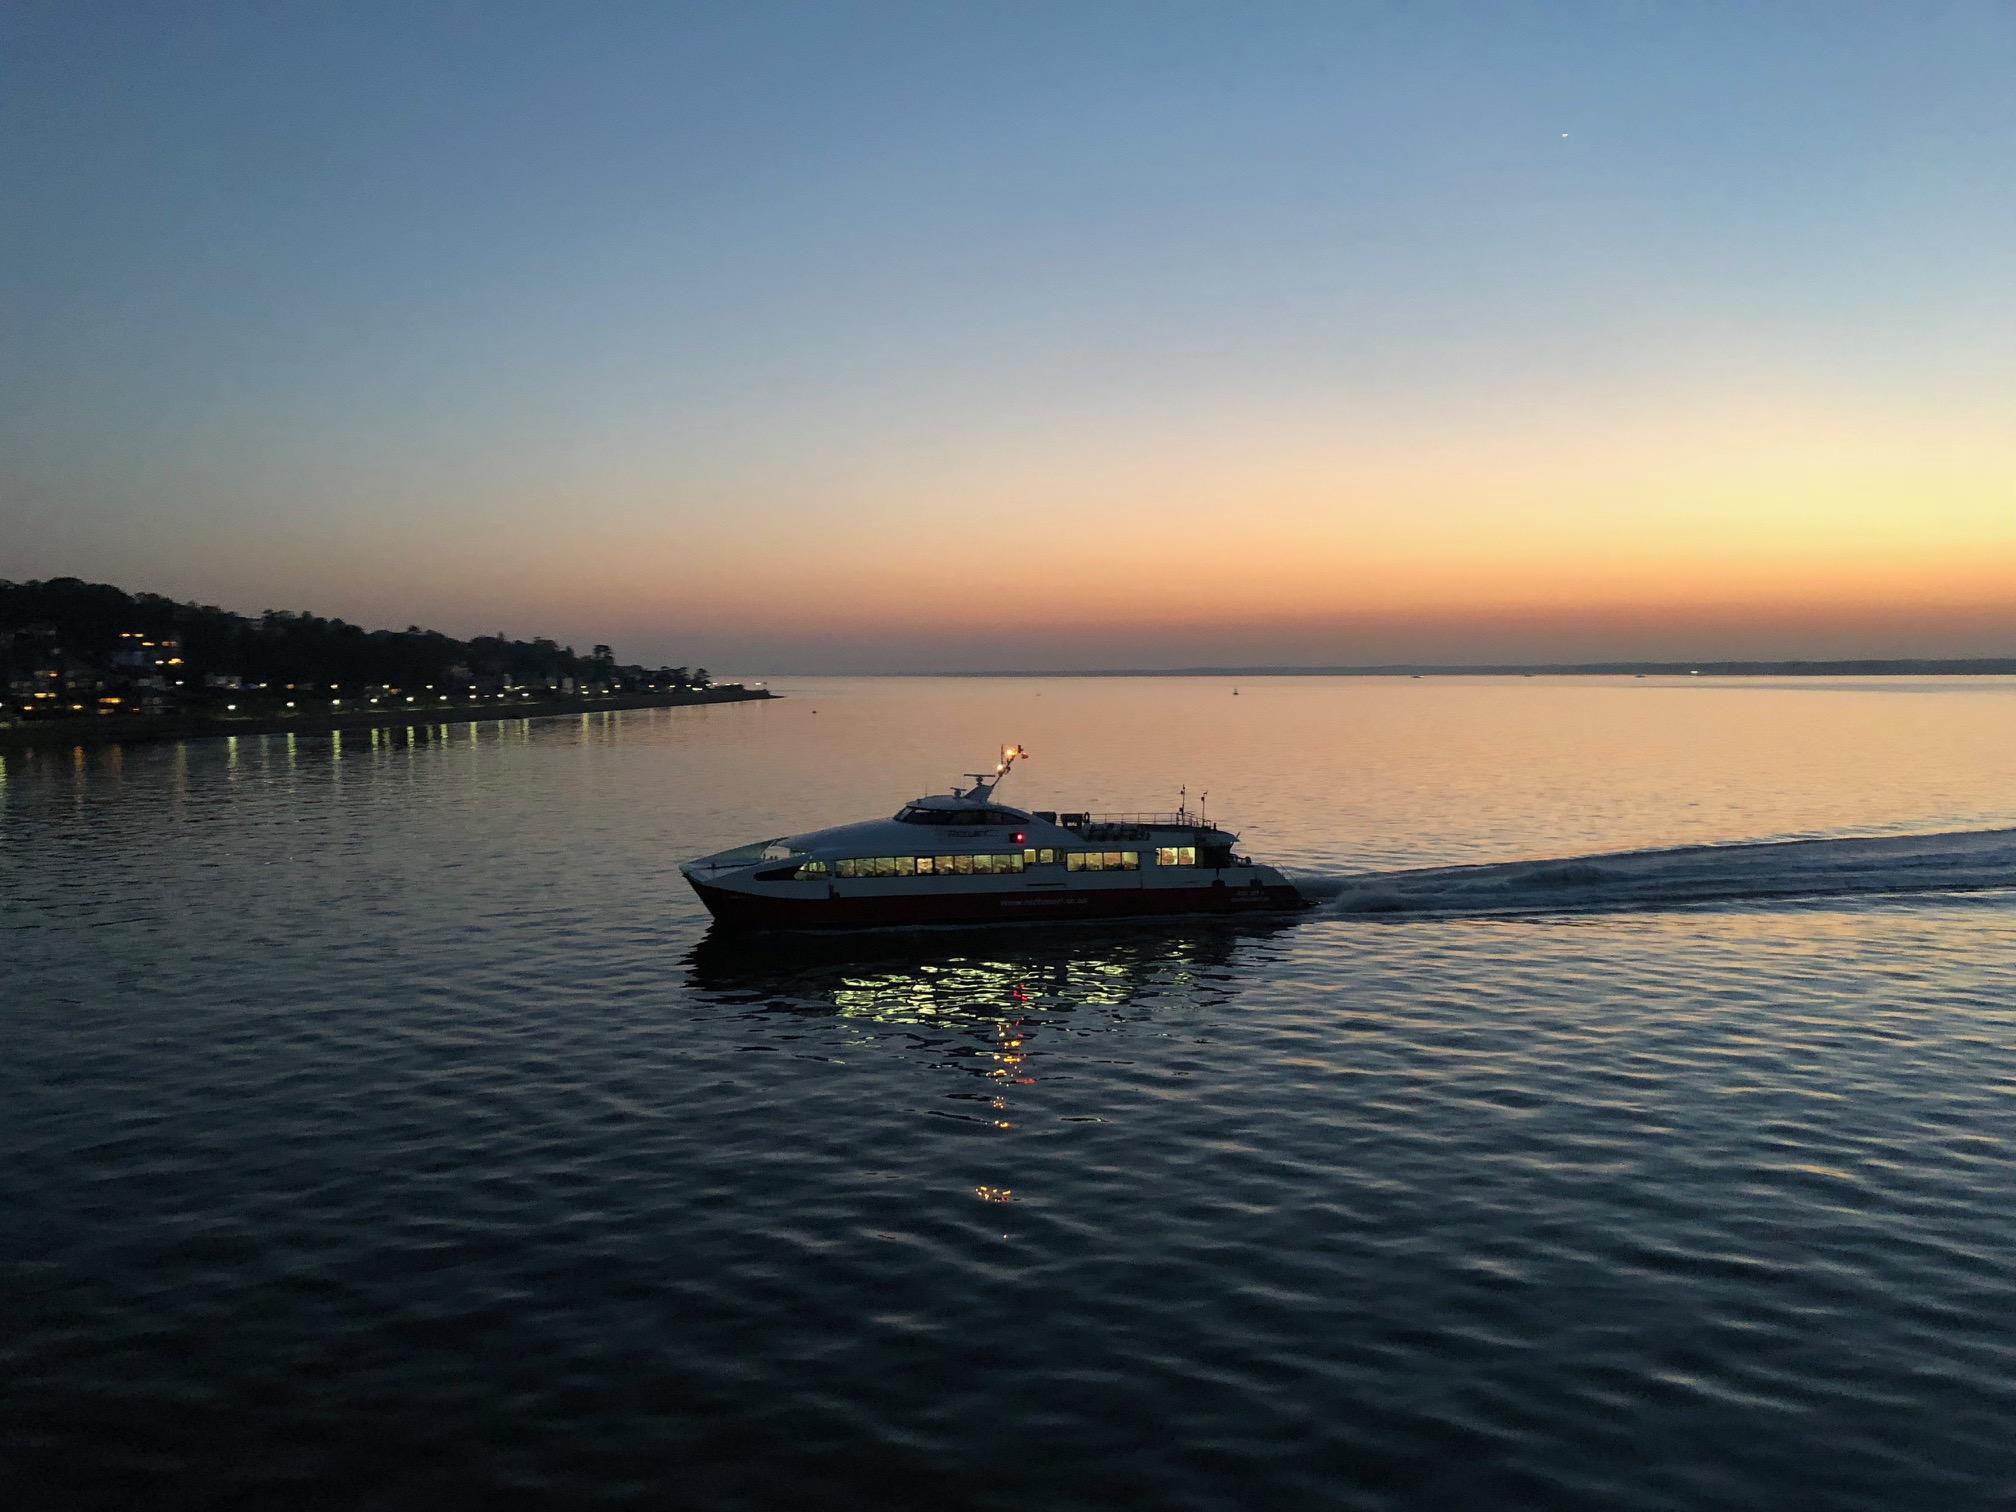 Southampton RIB Charter and Hire